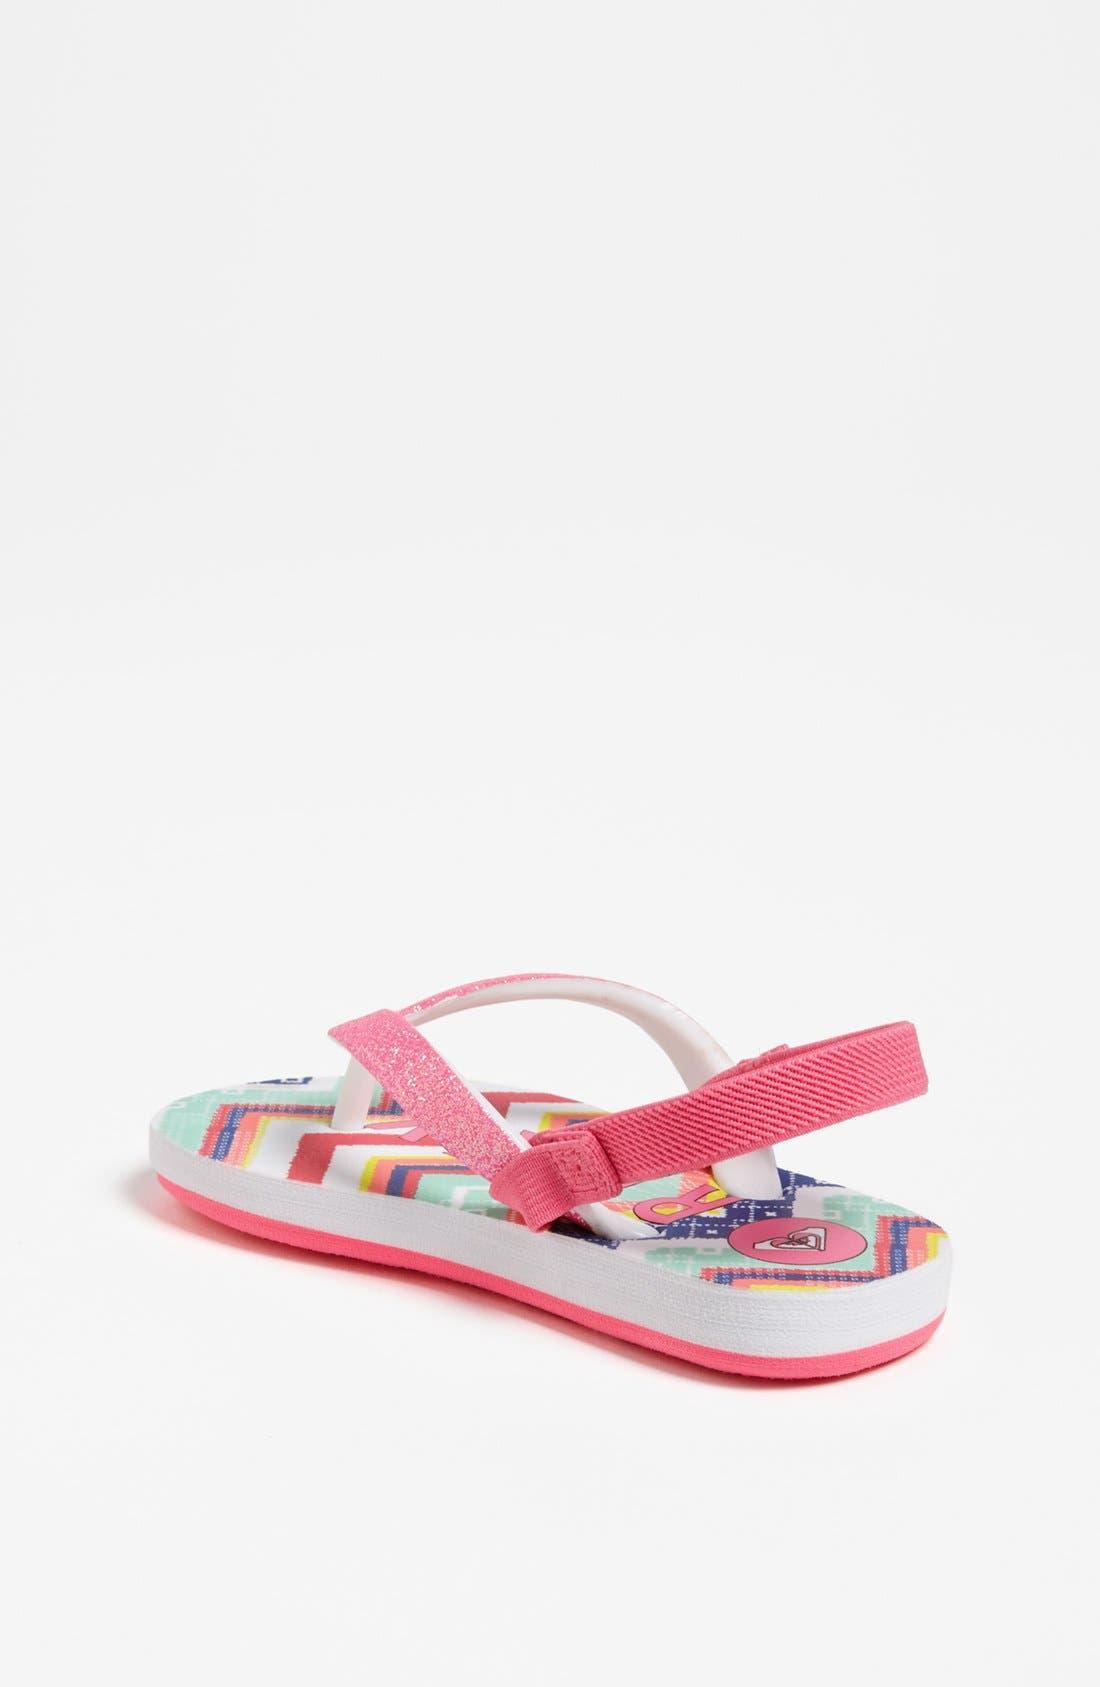 Alternate Image 2  - Roxy 'Tahiti' Sandal (Walker & Toddler)